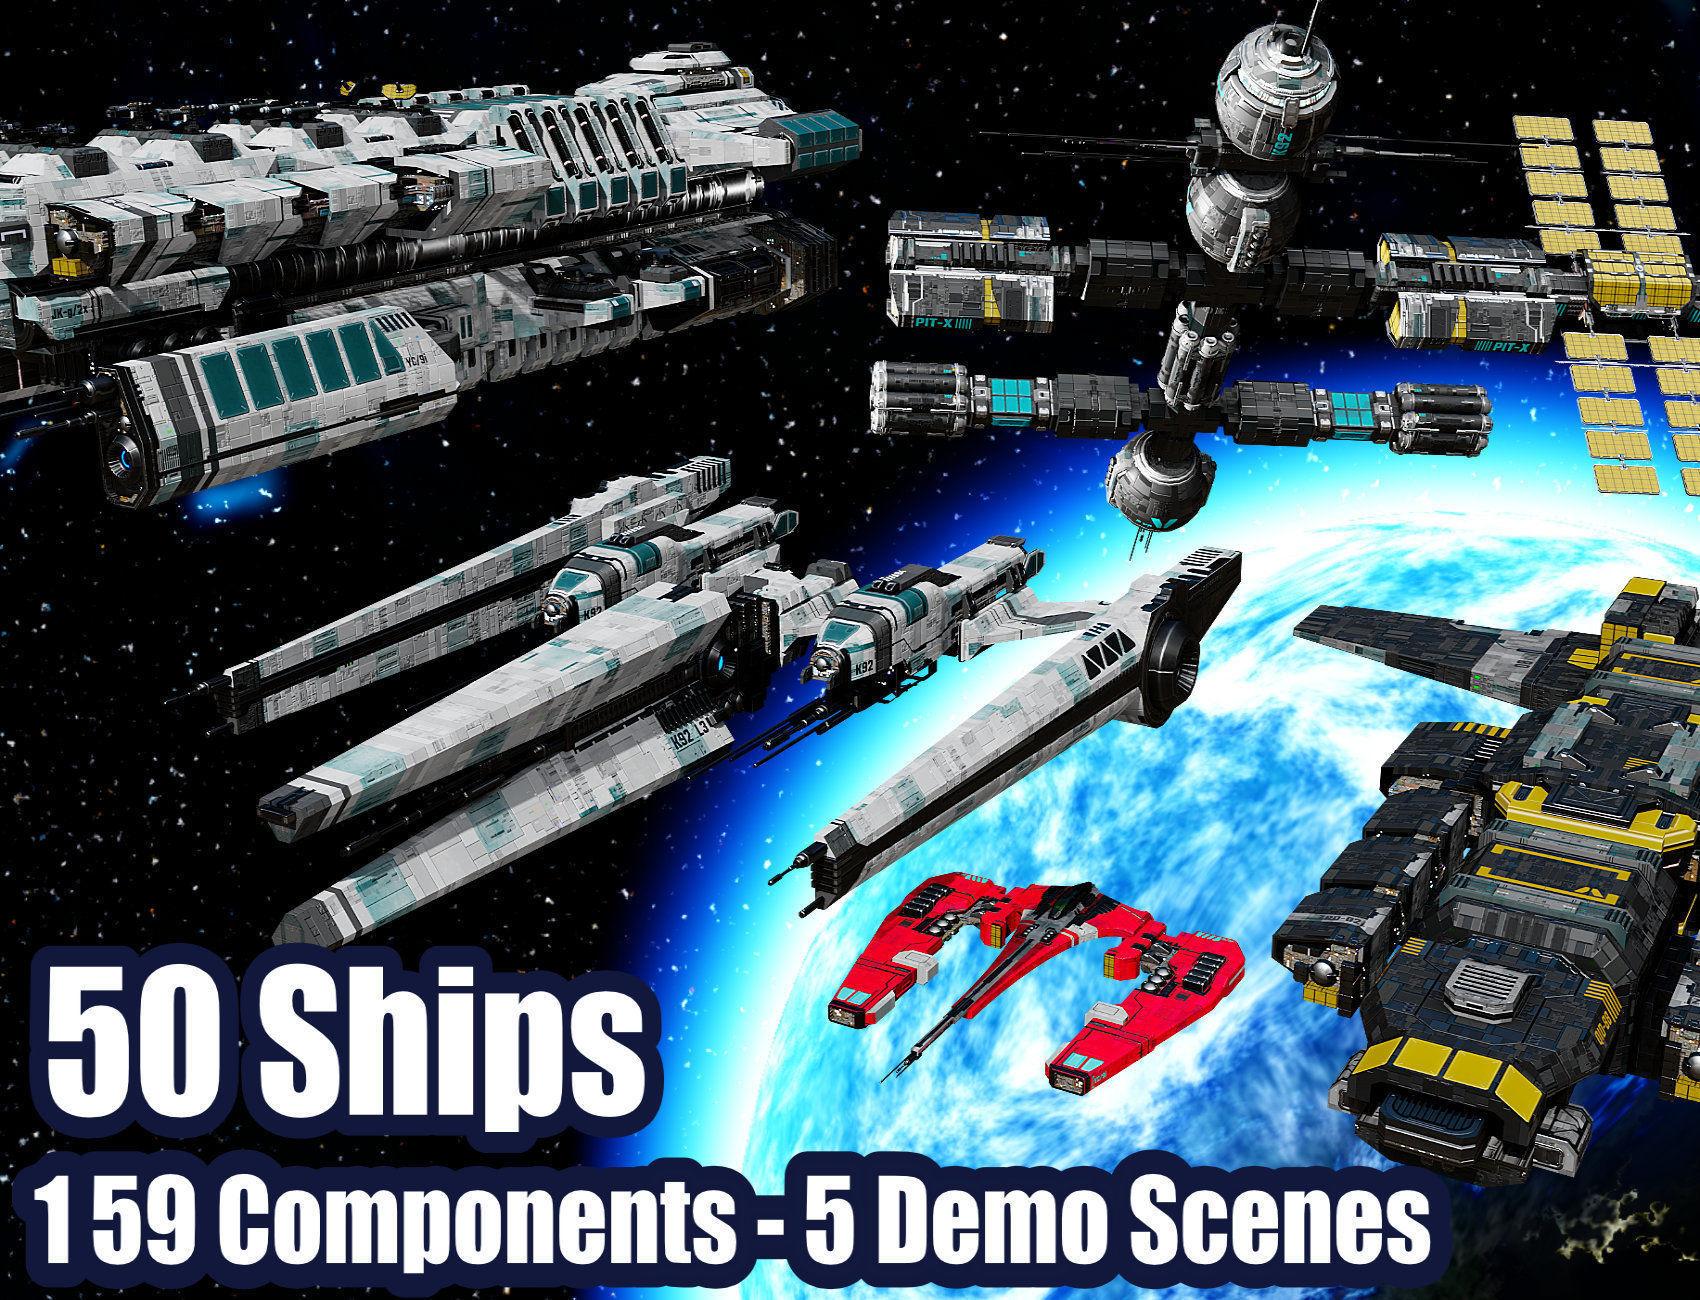 The Big Spaceship Builder